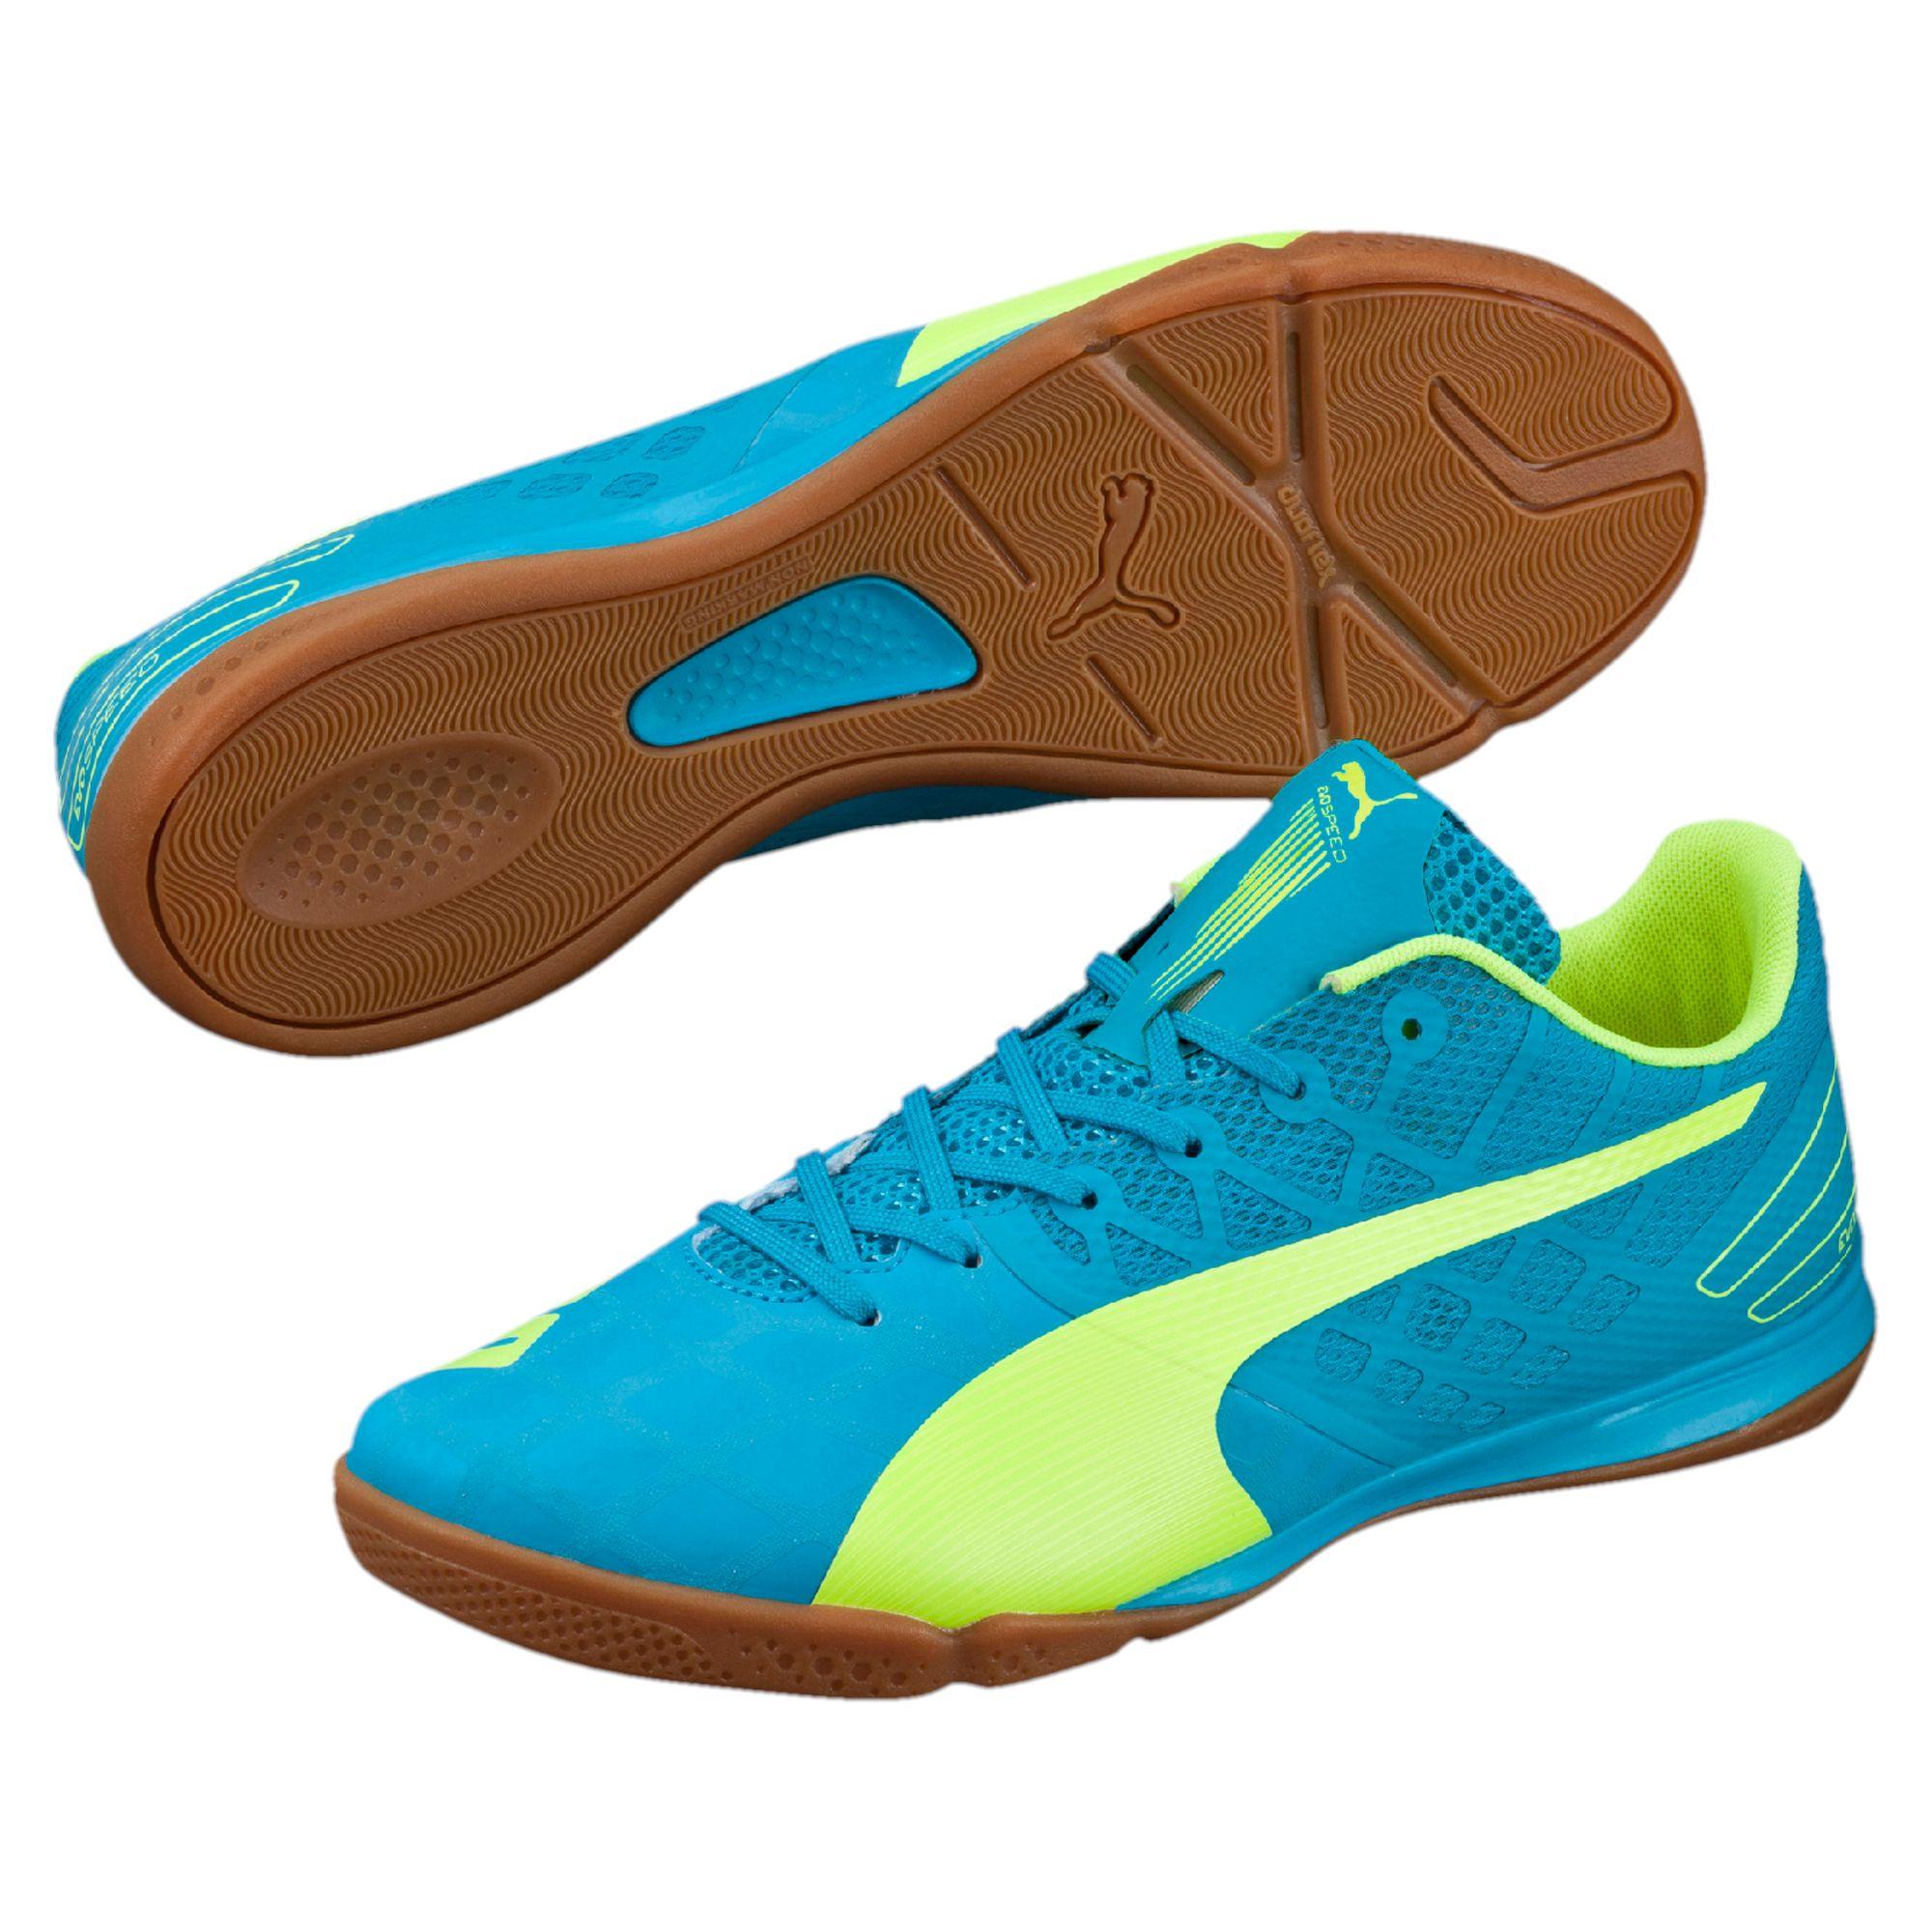 b0fb34f8a027 PUMA Evospeed Sala 3.4 Men's Indoor Soccer Shoes in Blue for Men - Lyst